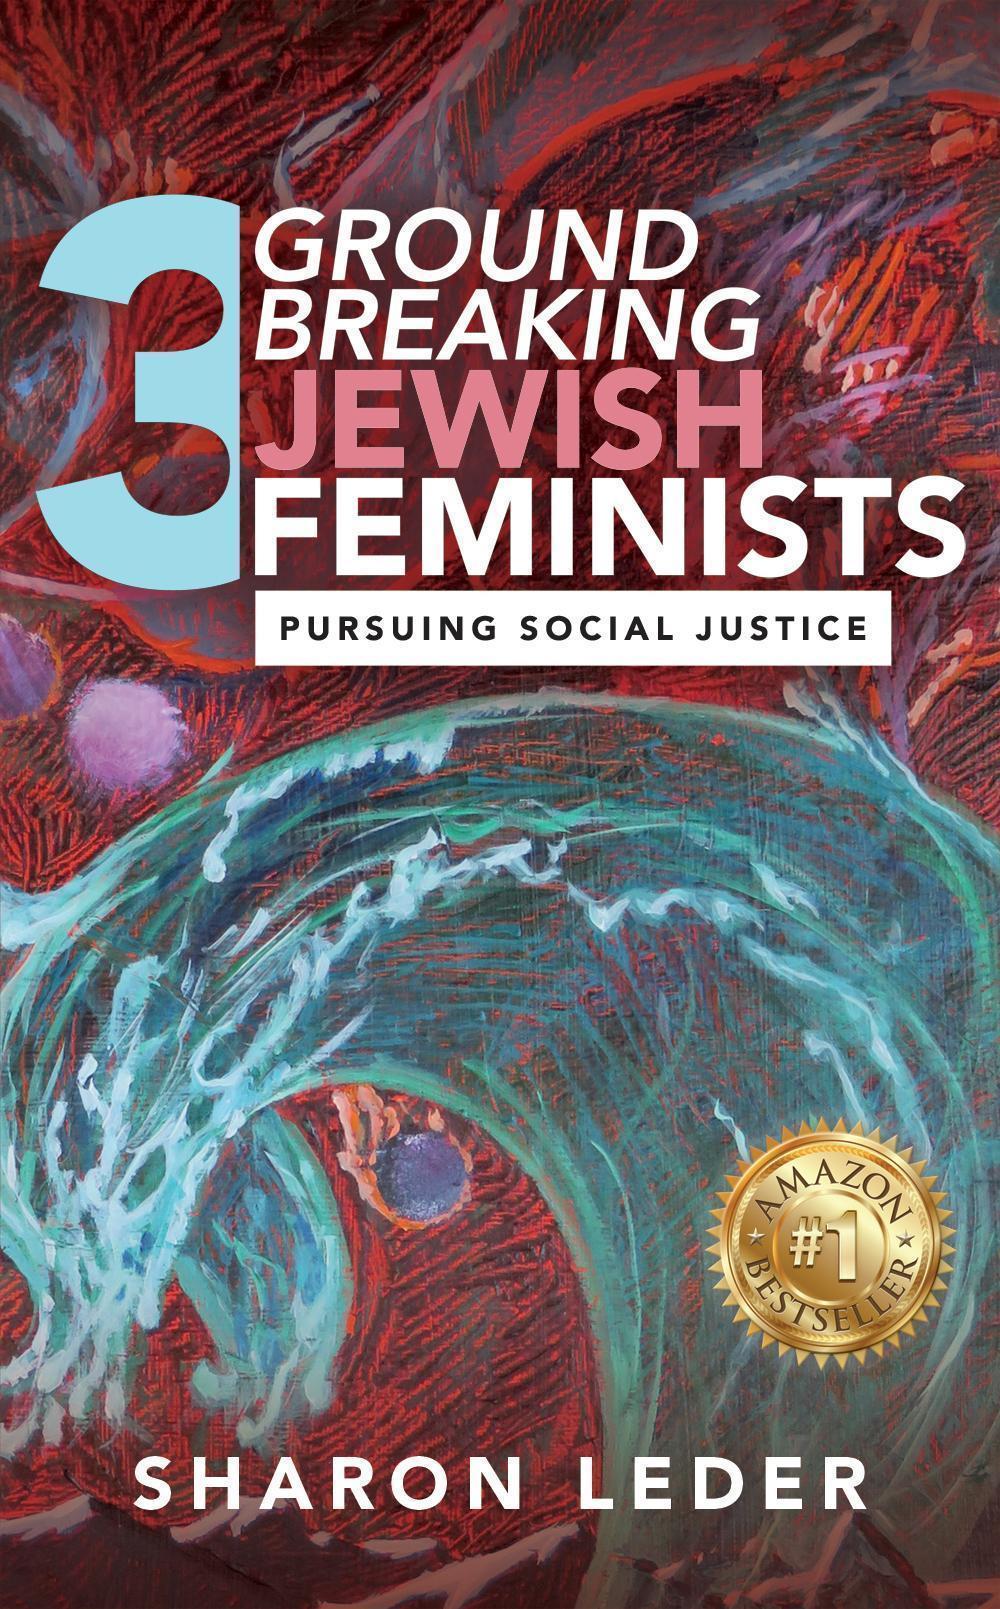 Three Groundbreaking Jewish Feminists by Sharon Leder